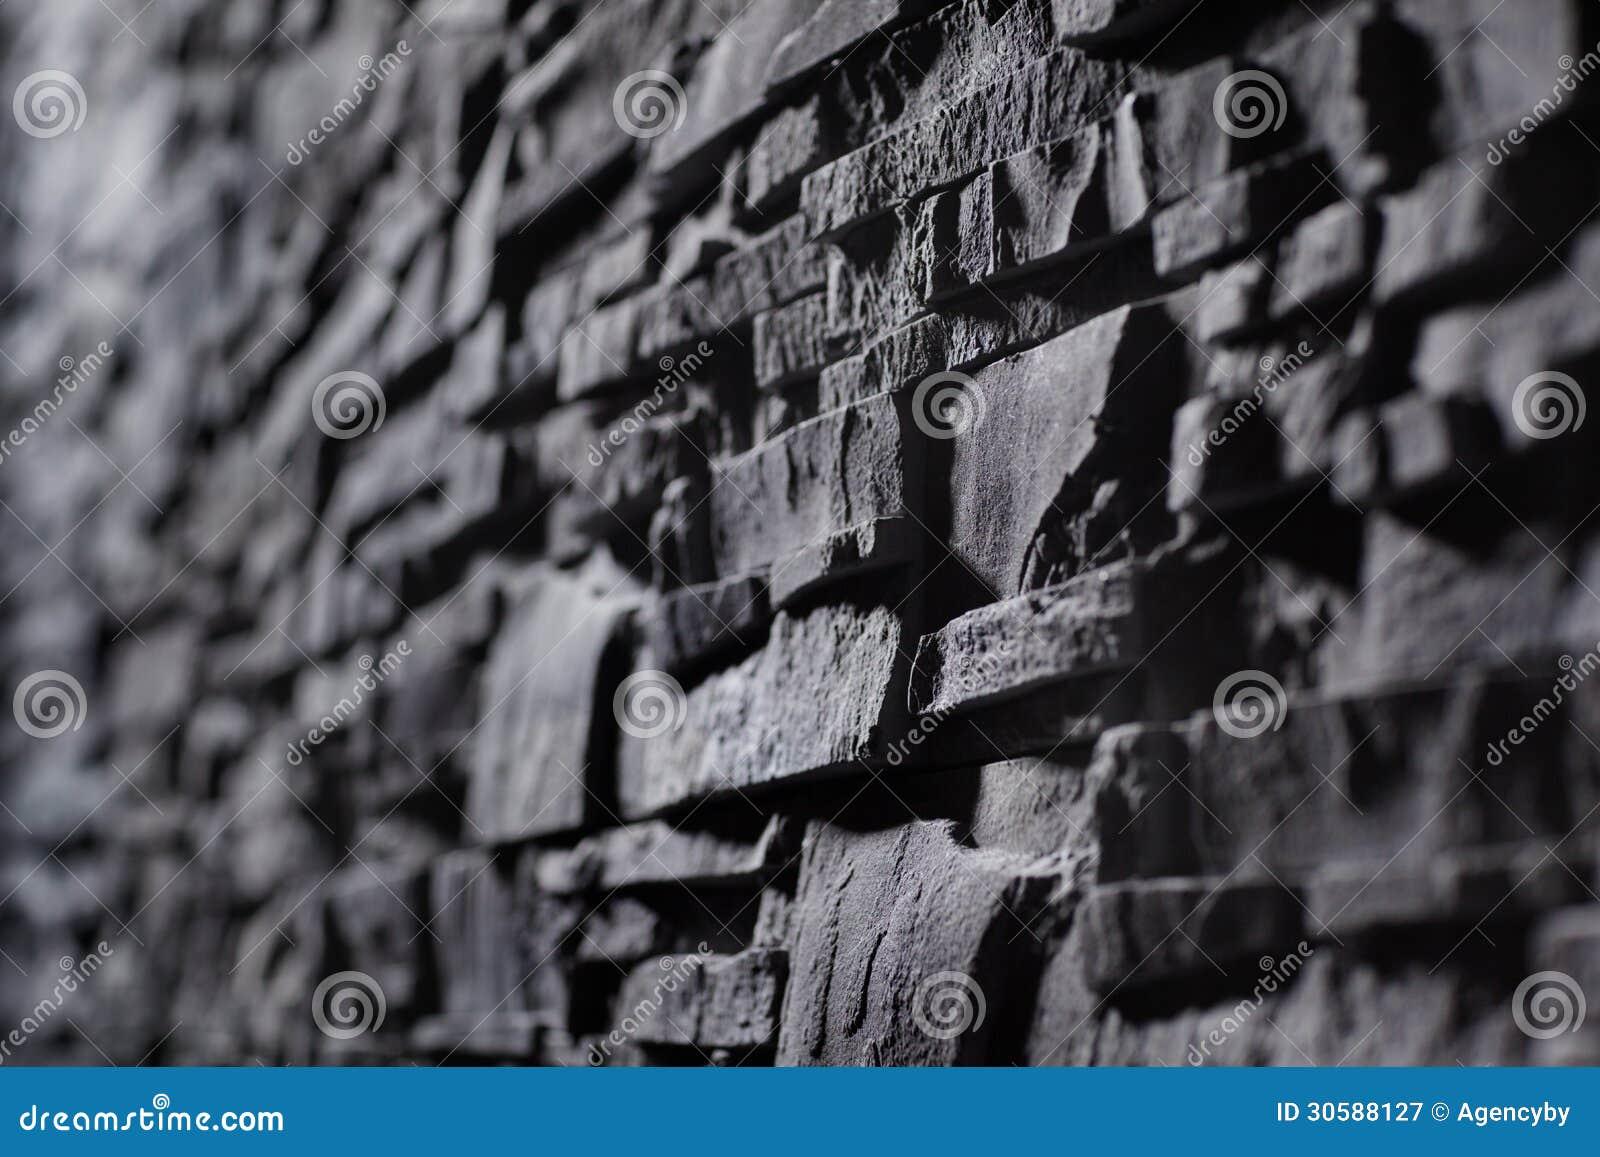 beschaffenheit des graus legen steine in den weg stockbild - bild